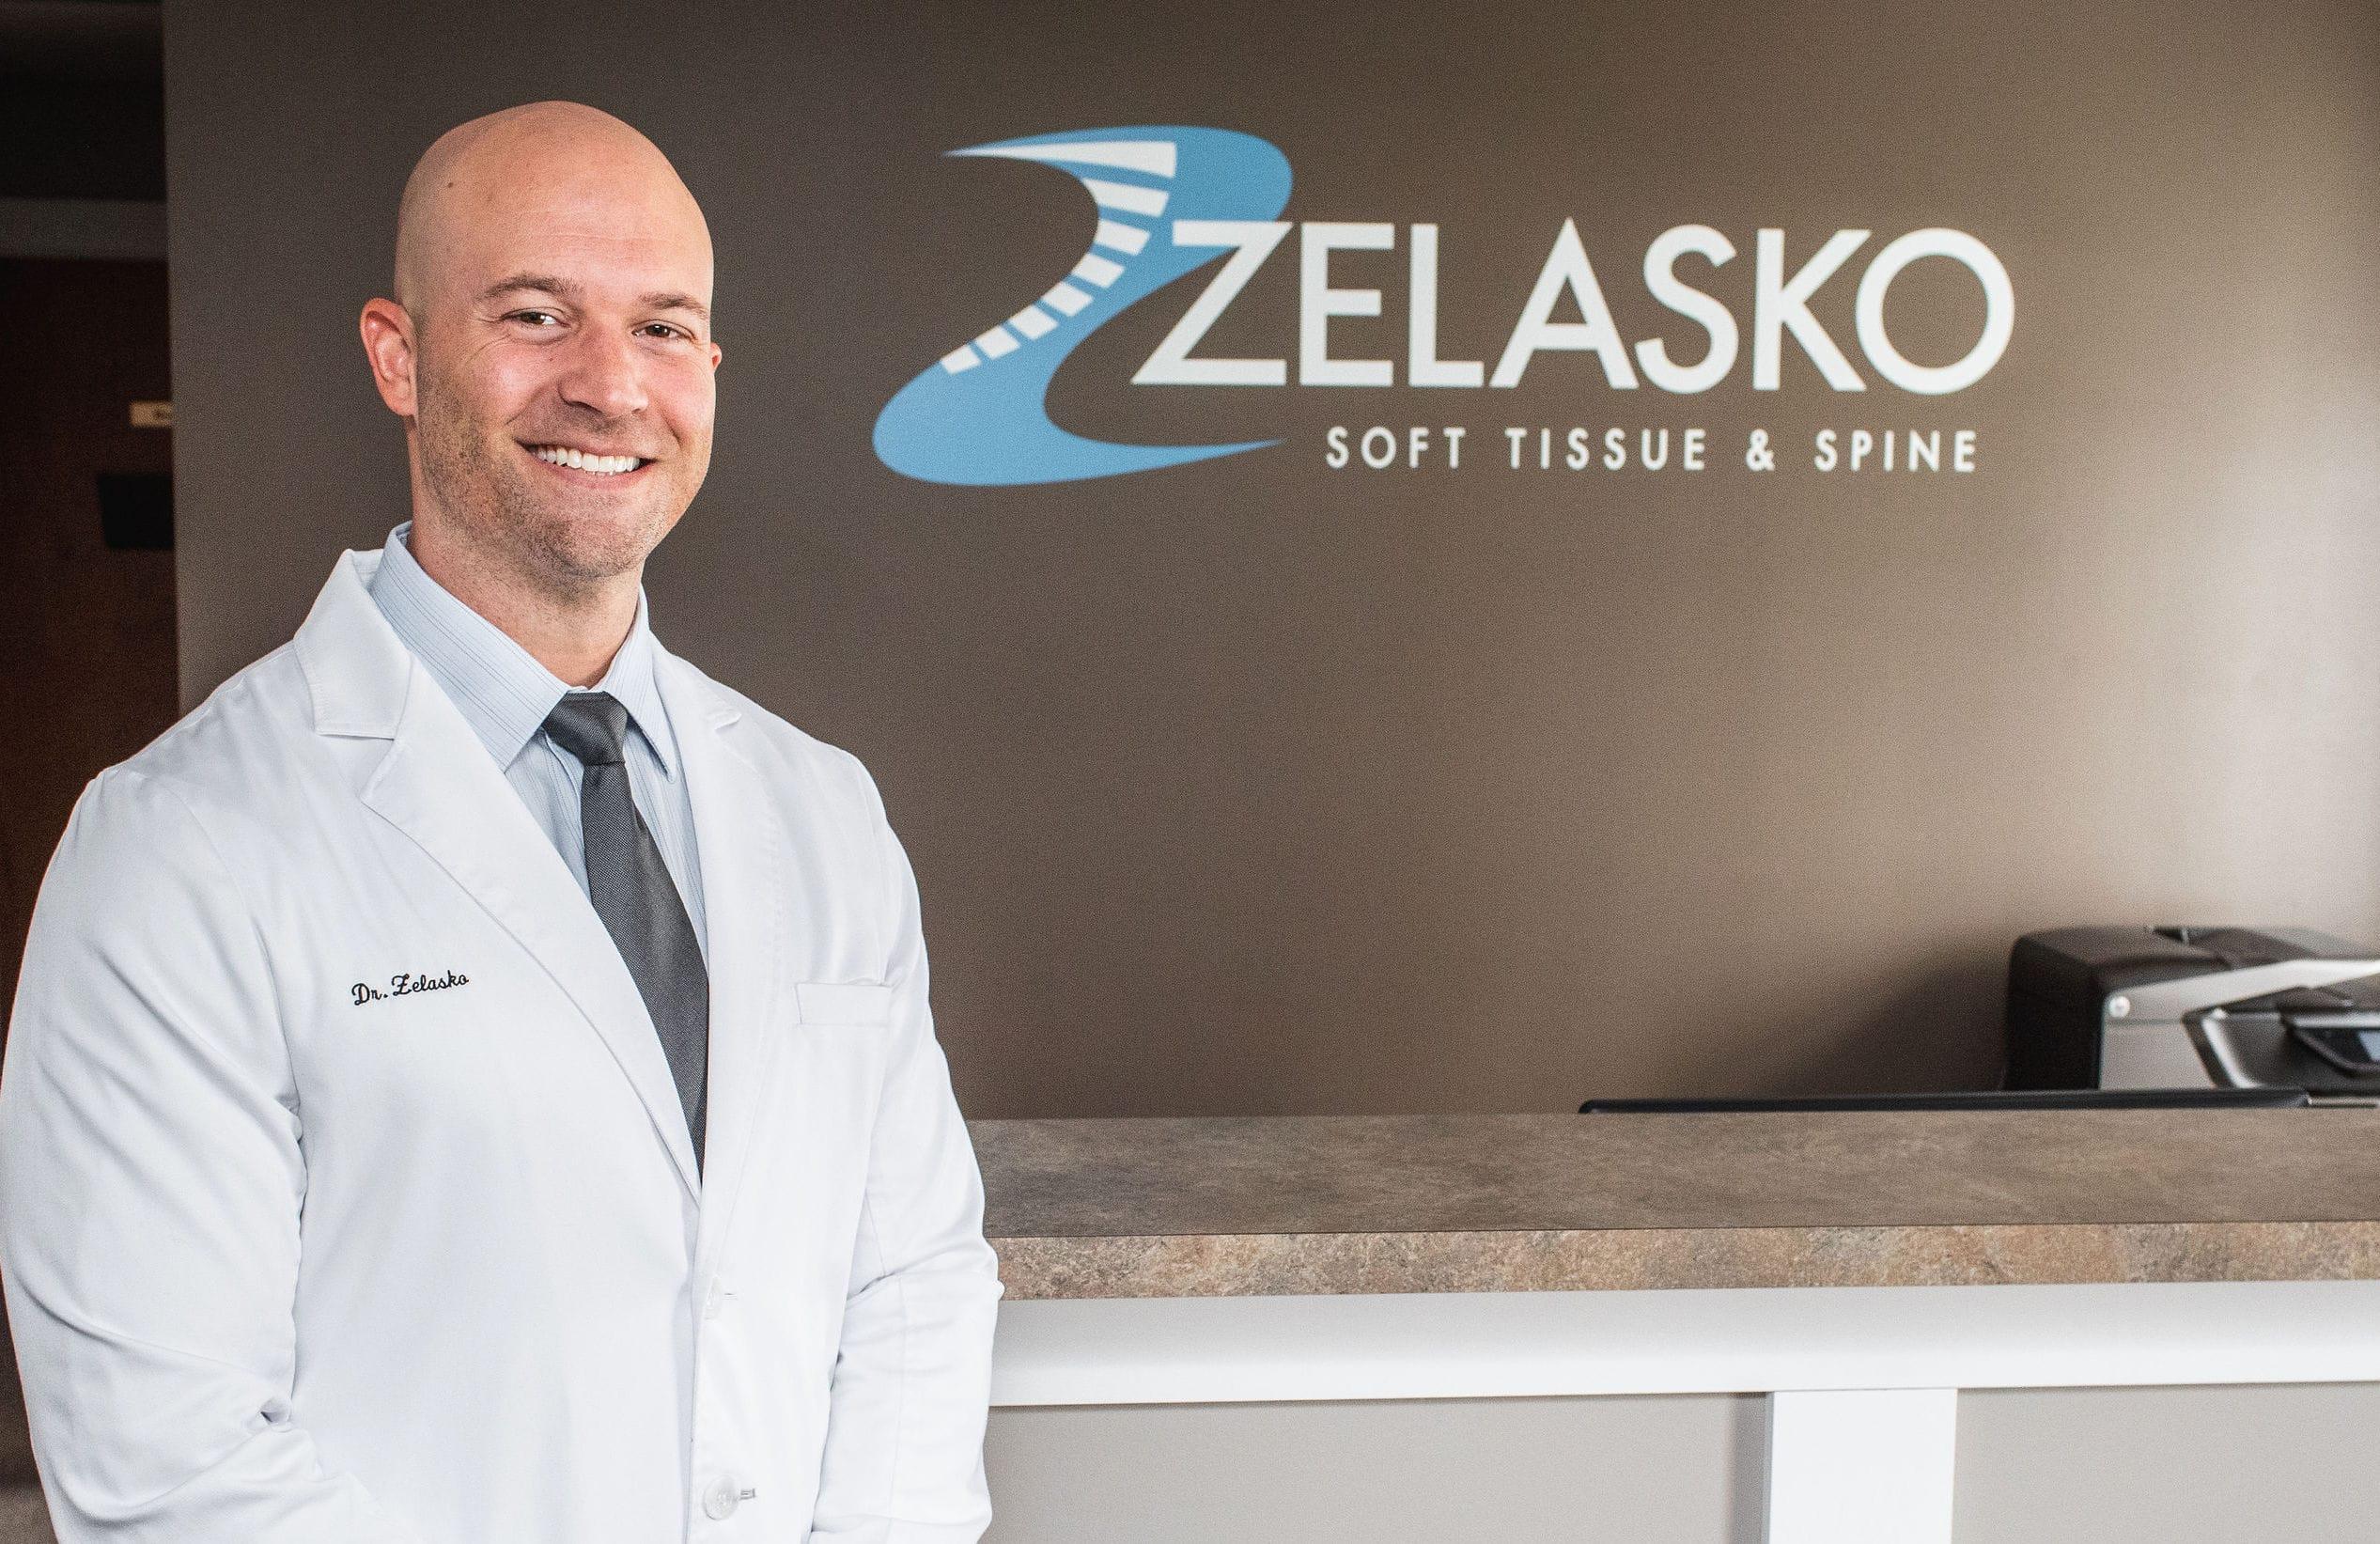 Chiropractor Dr. Brian A. Zelasko standing in white physician's lab coat in front of Zelasko Soft Tissue & Spine Logo within practice